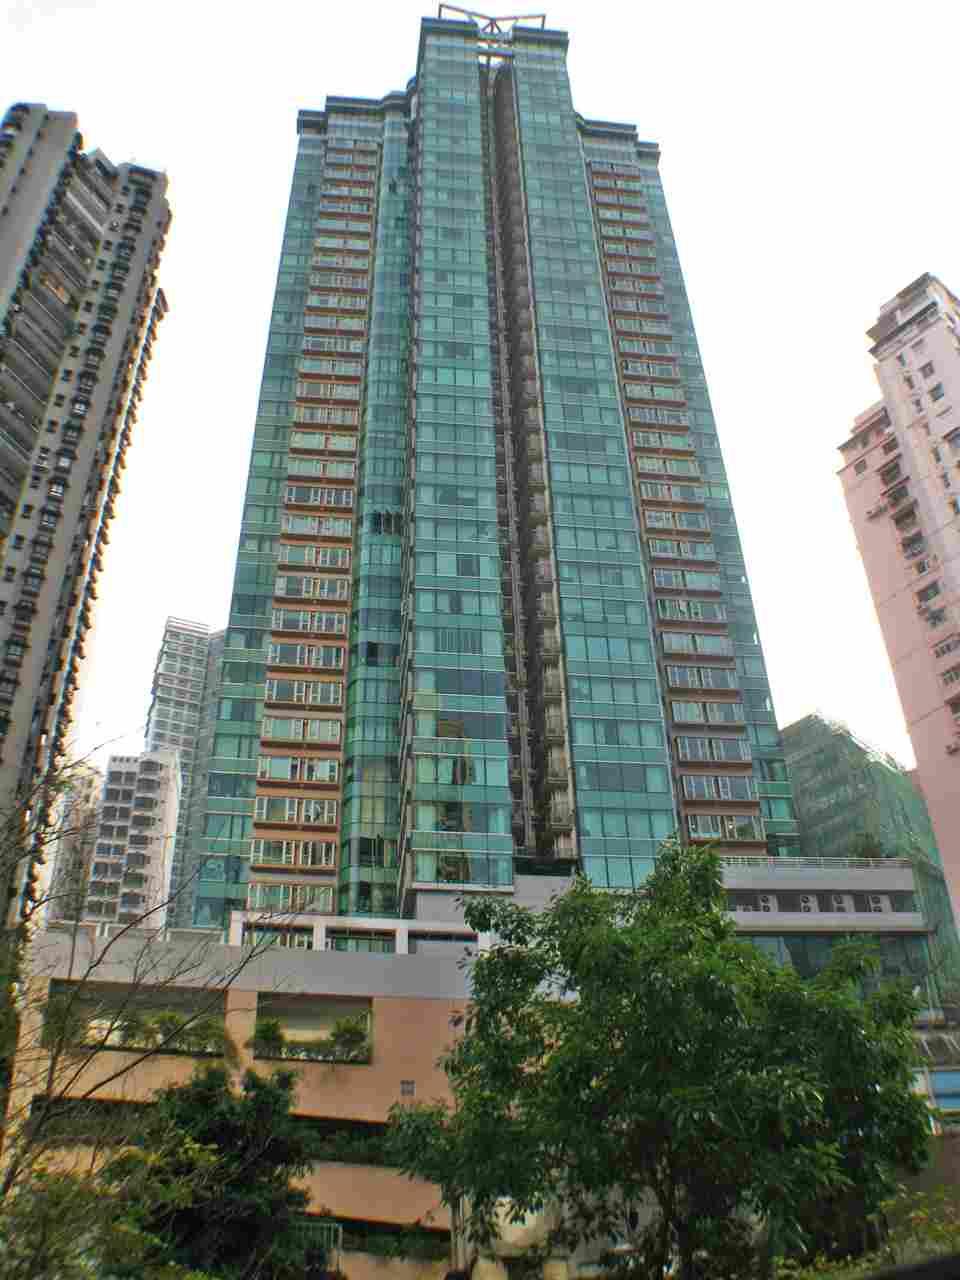 Casa bella mid levels west apartment for sale executive for Casa bella